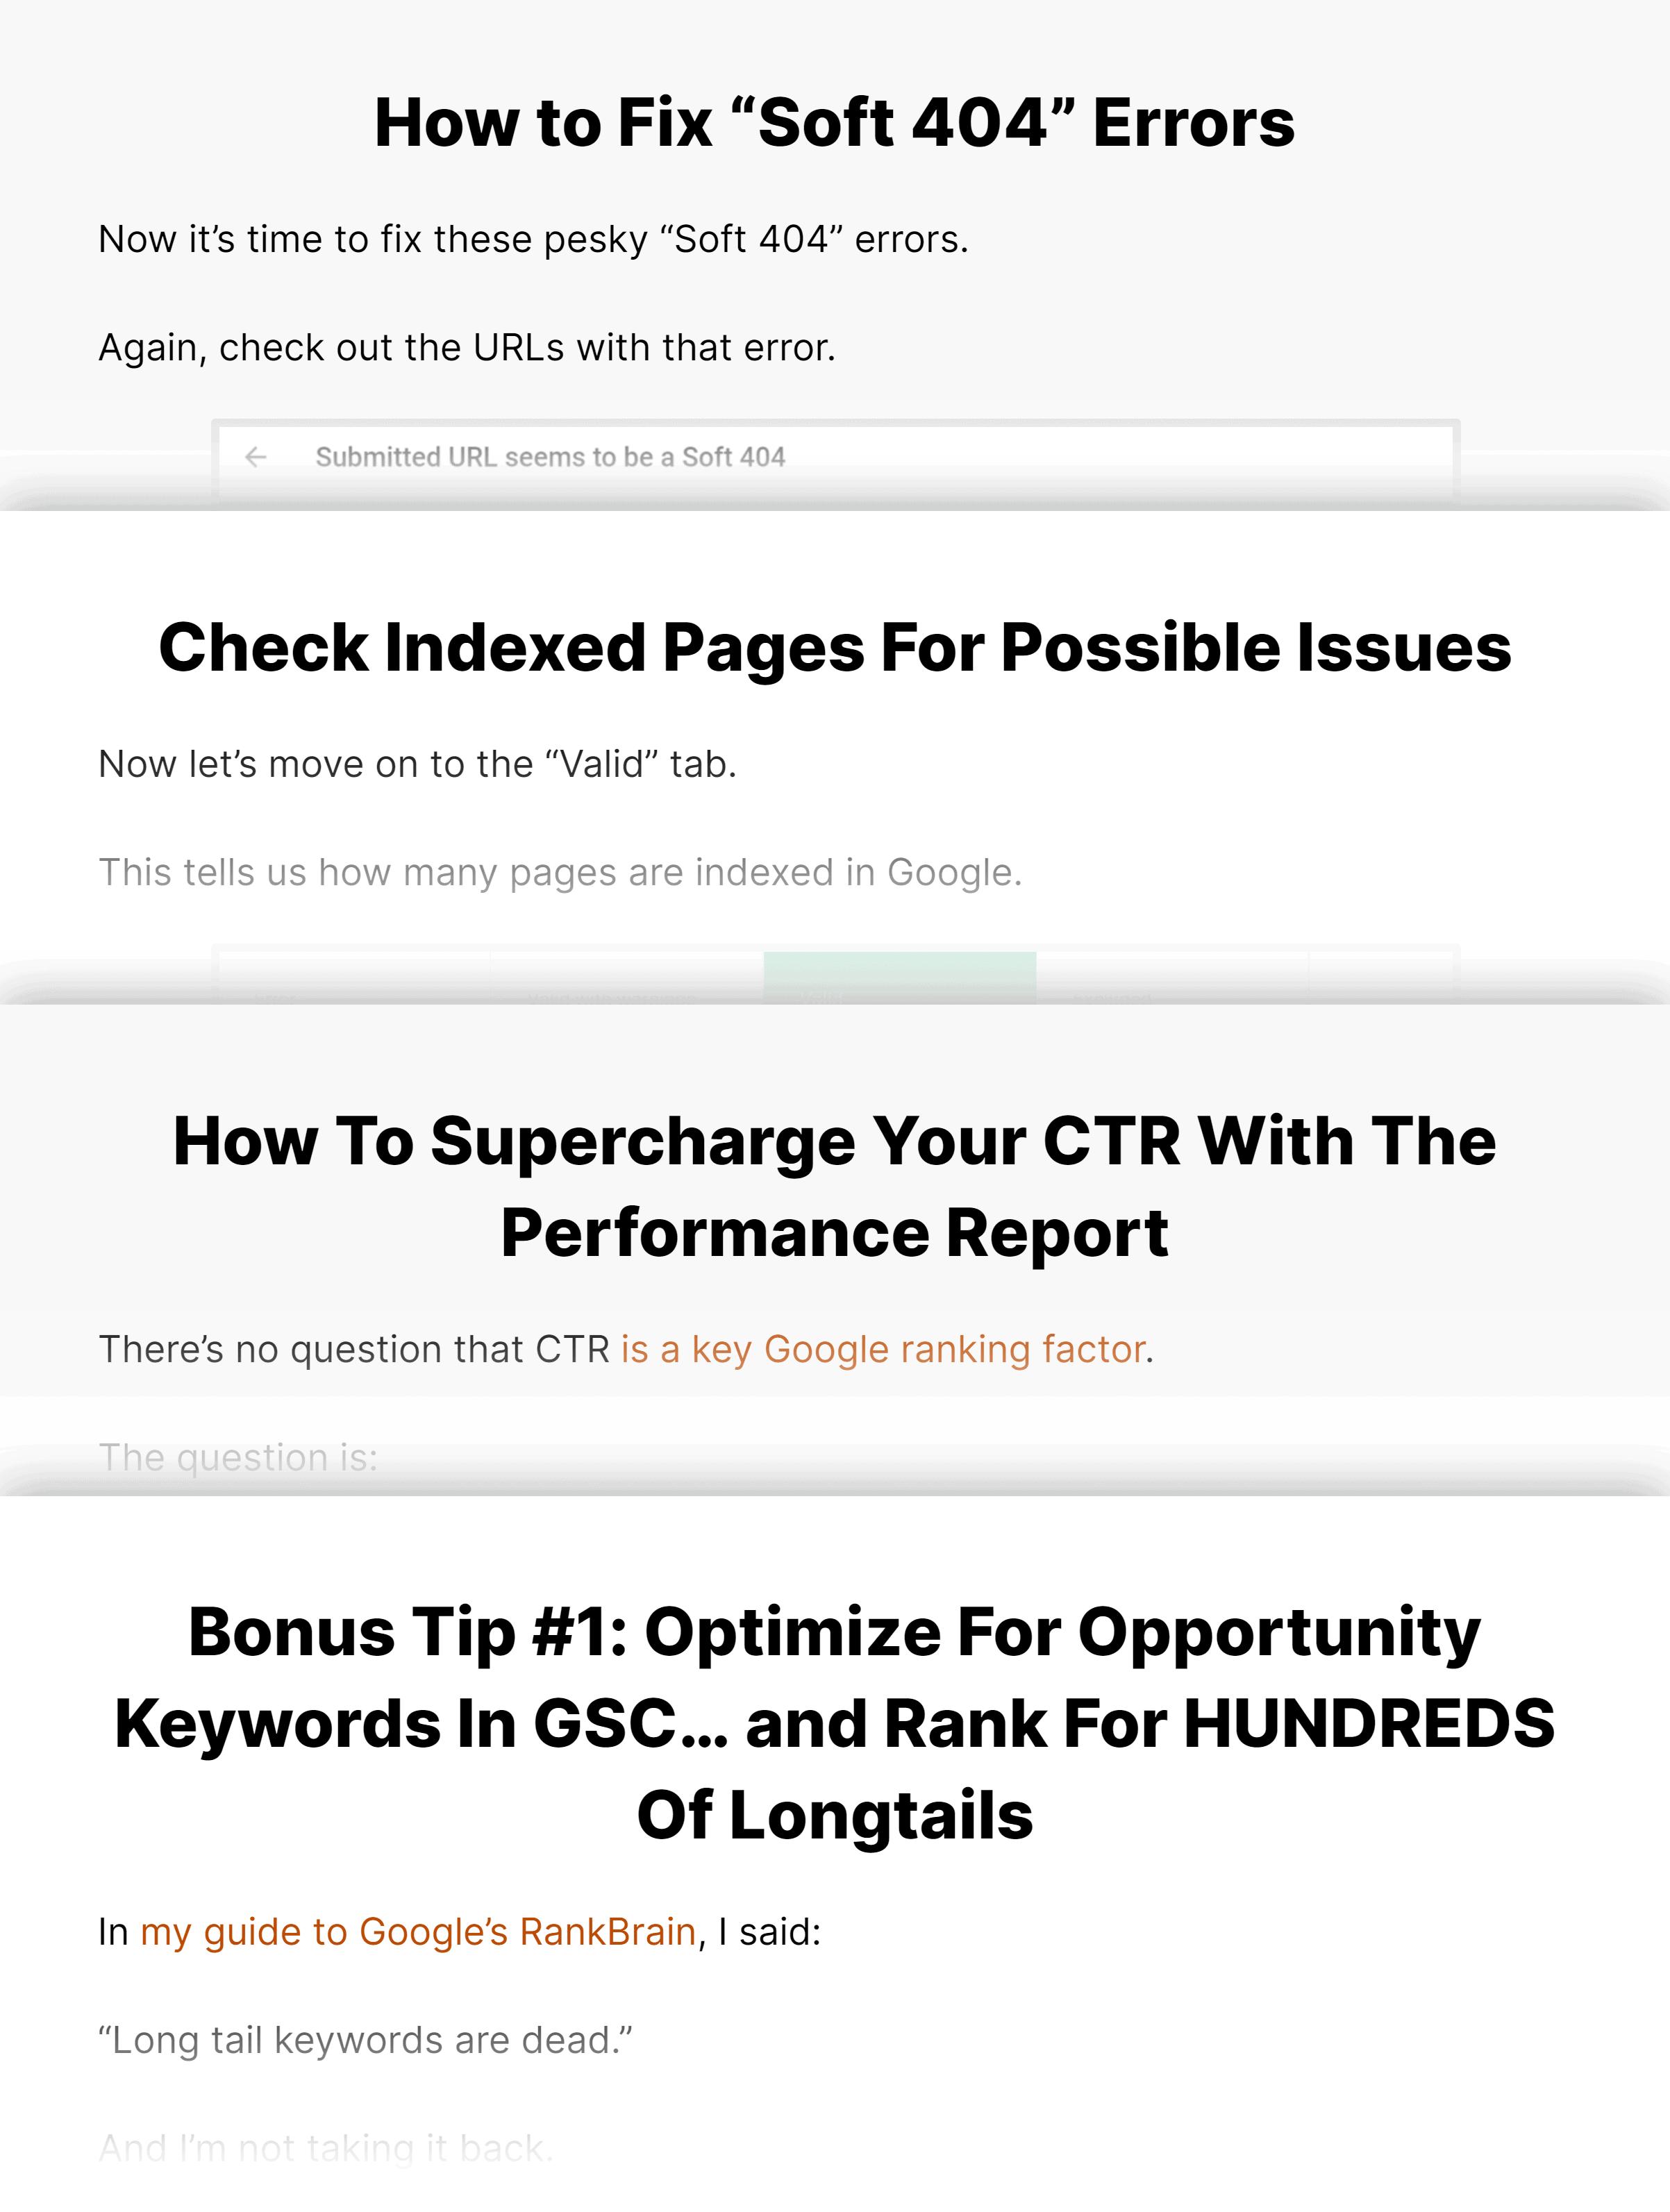 Google Search Console post content